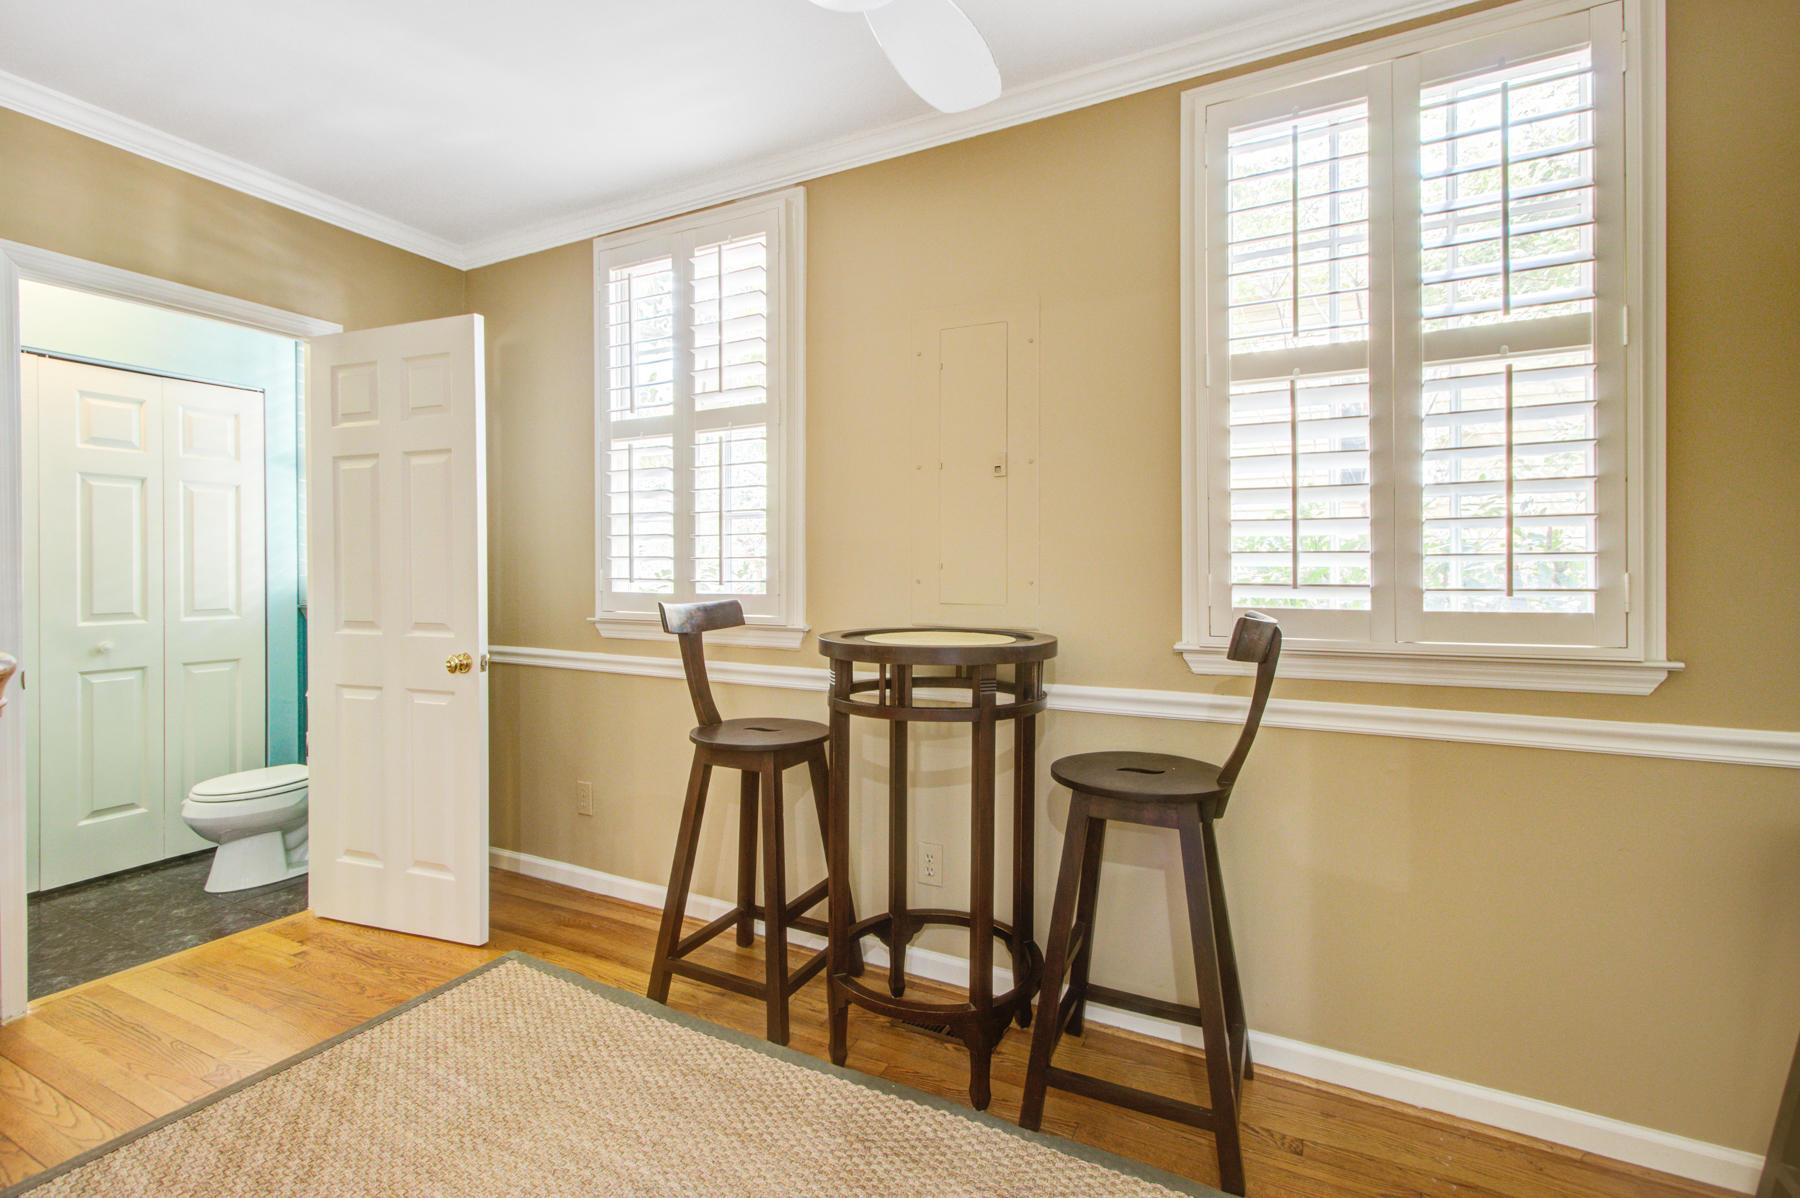 Radcliffeborough Homes For Sale - 48 Radcliffe, Charleston, SC - 9